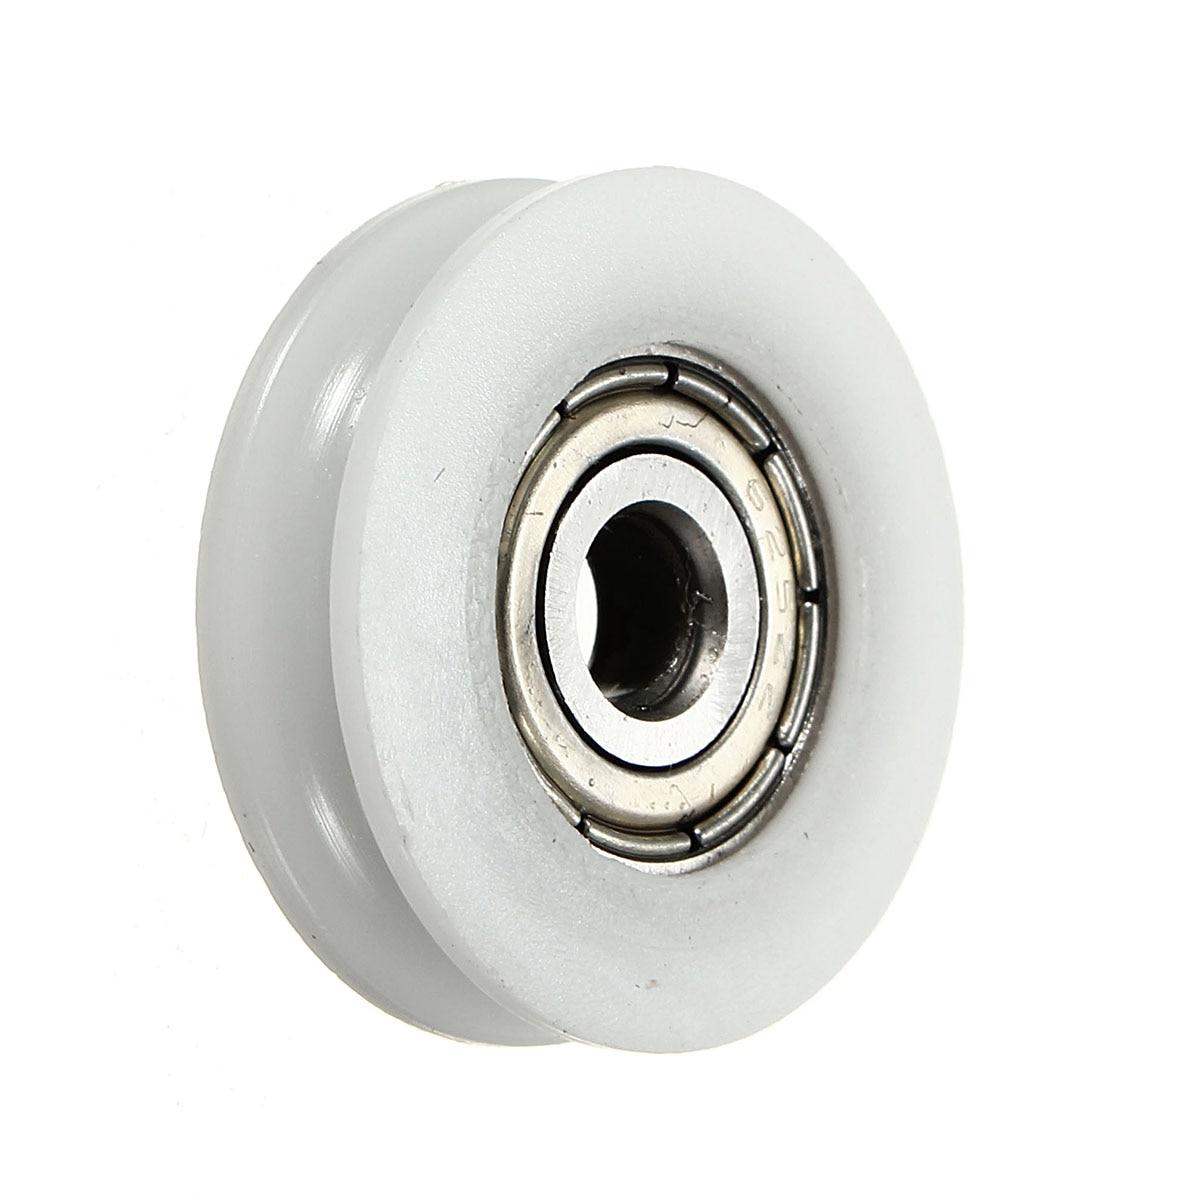 Puuli 8pcs Mini 0.34 4400-6600lbs Nylon Furniture Ball Transfer Unit Mounted Bearing Transfer Furniture Sliding Roller Pulley Wheel